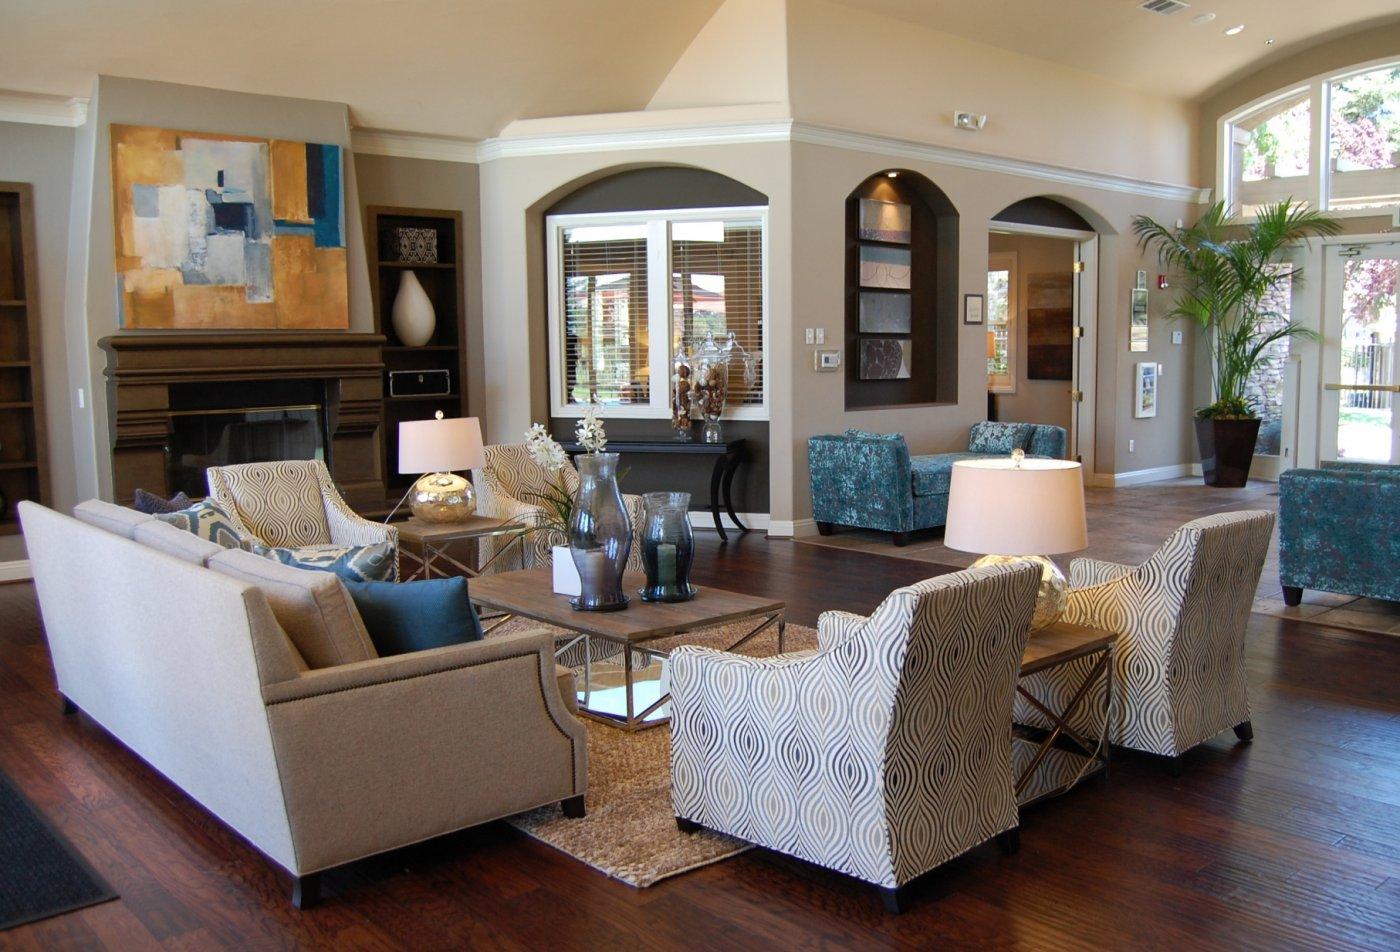 Roseville CA Apartments | Pinnacle at Galleria Apartments